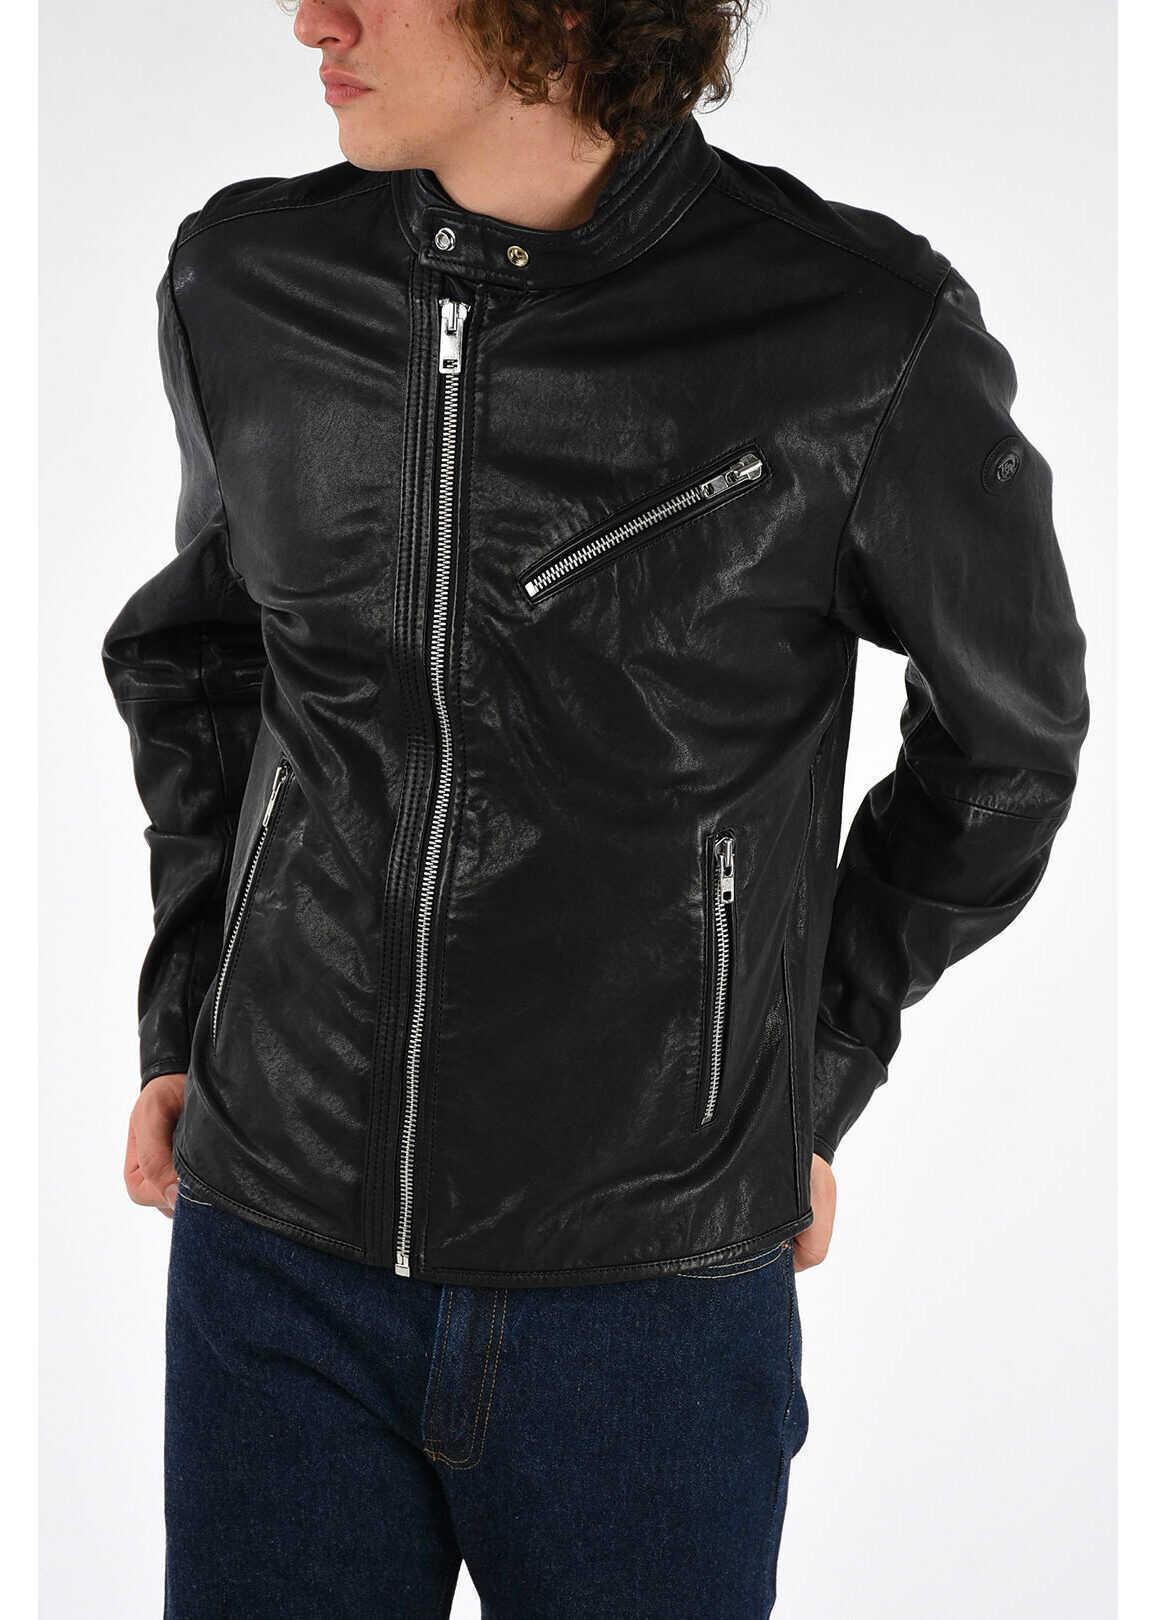 Diesel Leather RAMYTON Jacket BLACK imagine